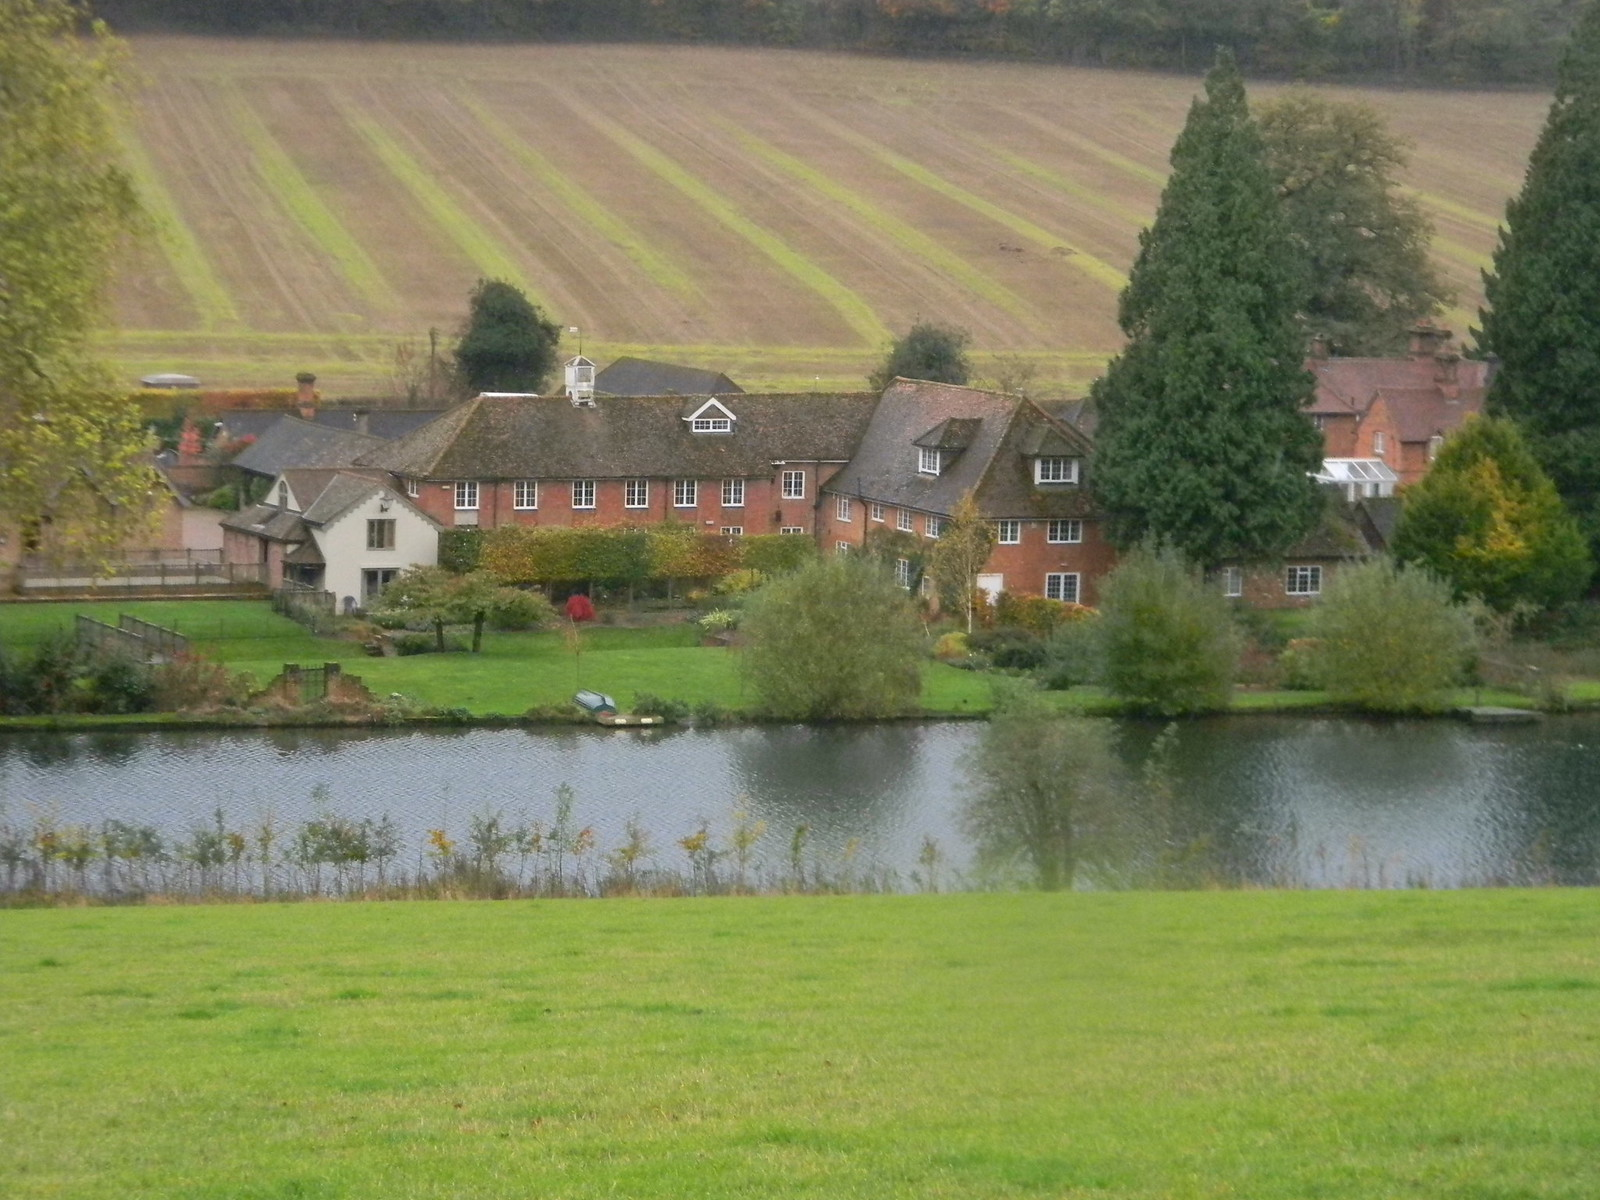 Farm by the Chess Chorleywood to Chesham